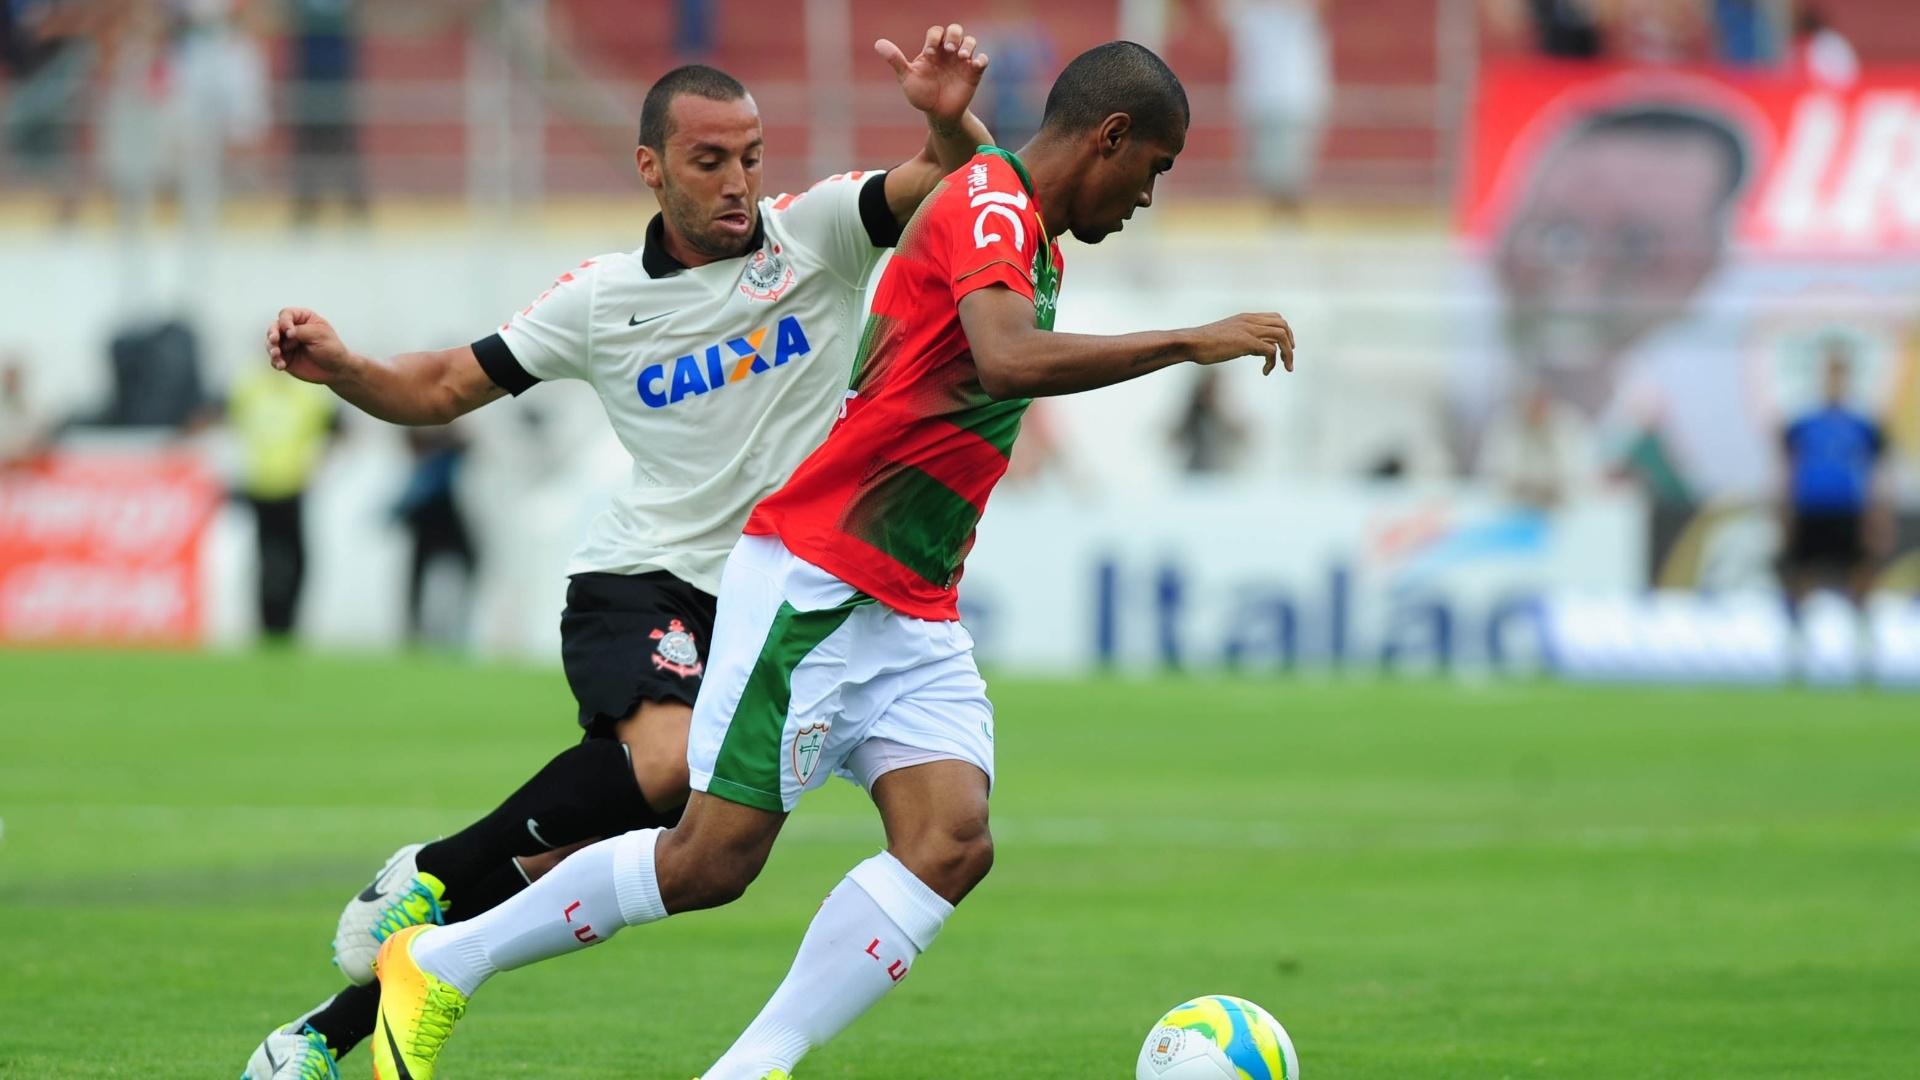 19.jan.2014 - Guilherme, do Corinthians, tenta roubar a bola de jogador da Portuguesa durante partida pelo Campeonato Paulista